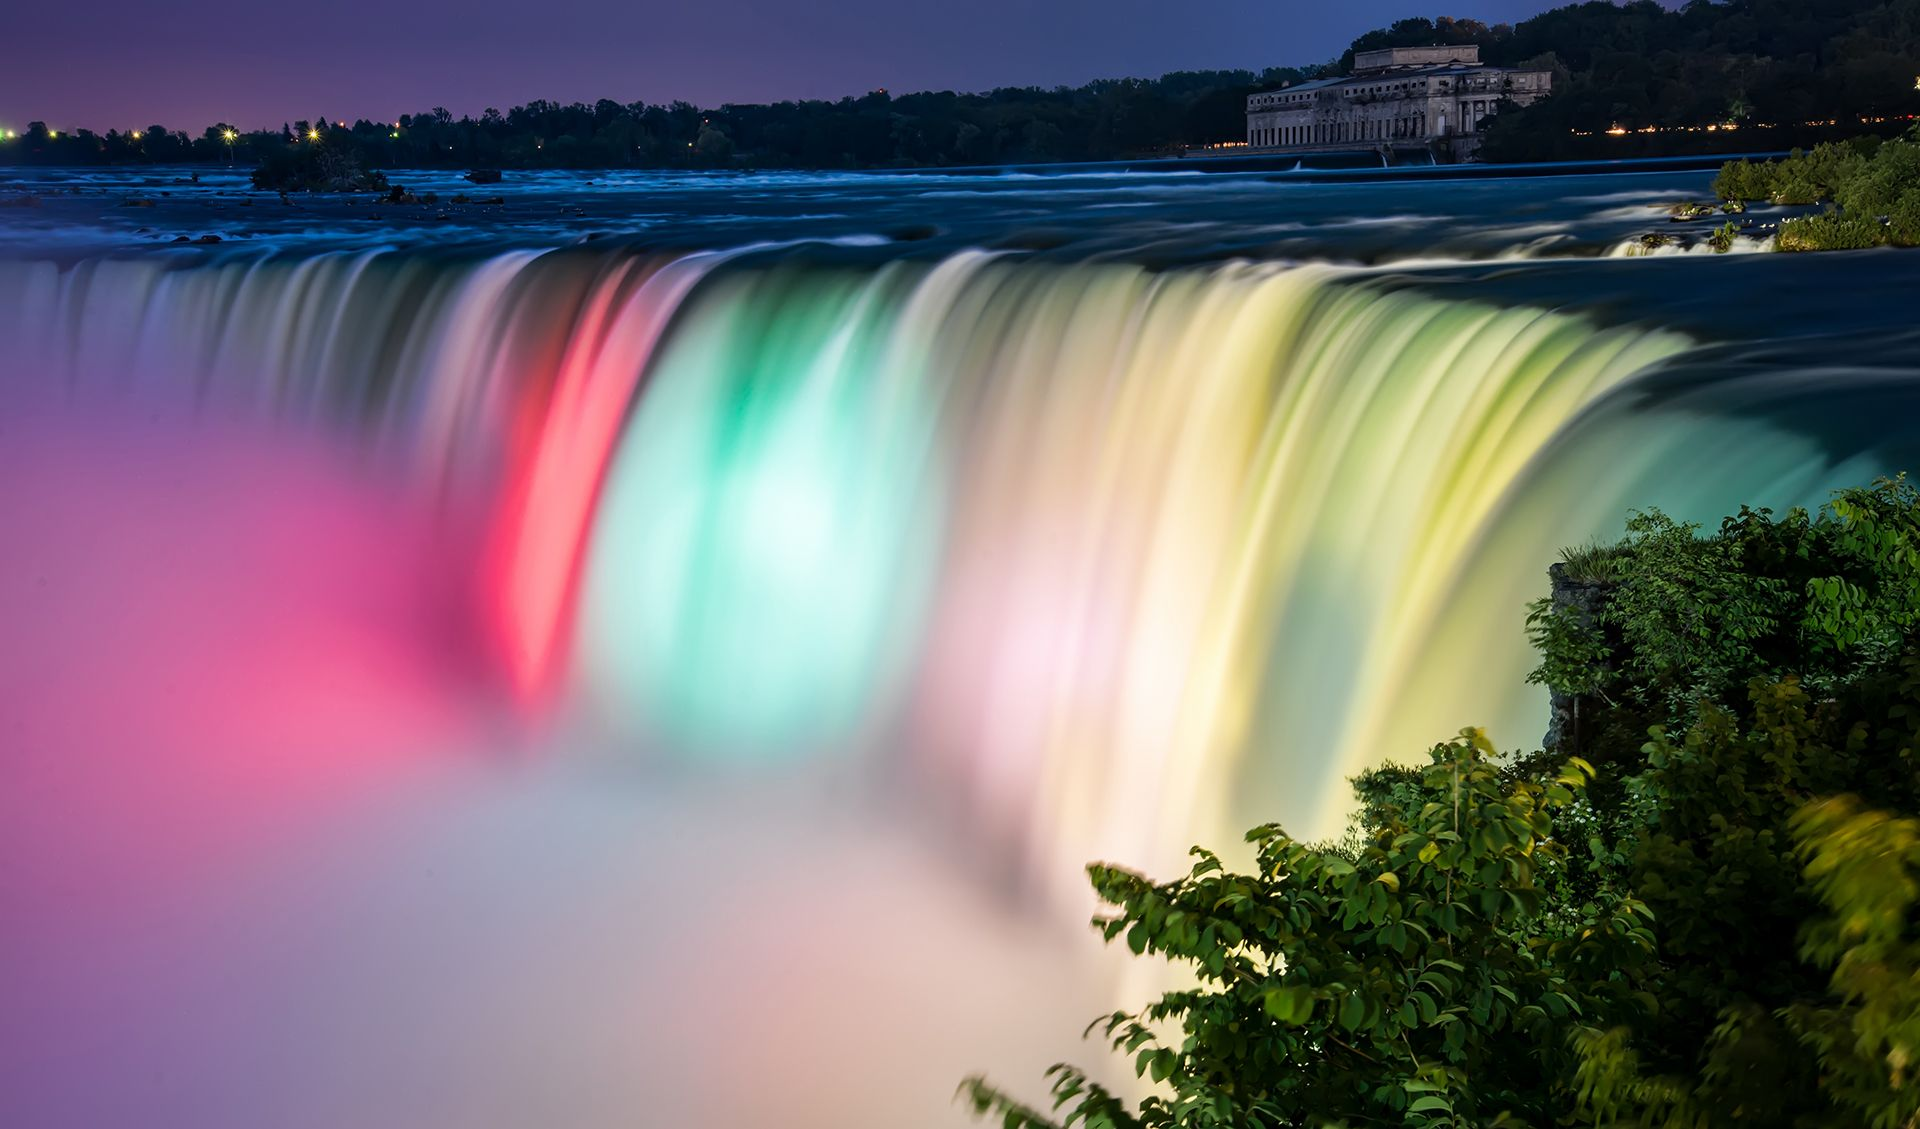 Hd Niagara Falls Wallpaper Wallpaper 3d Niagara Waterfalls Wallpapers Hd Wallpapera